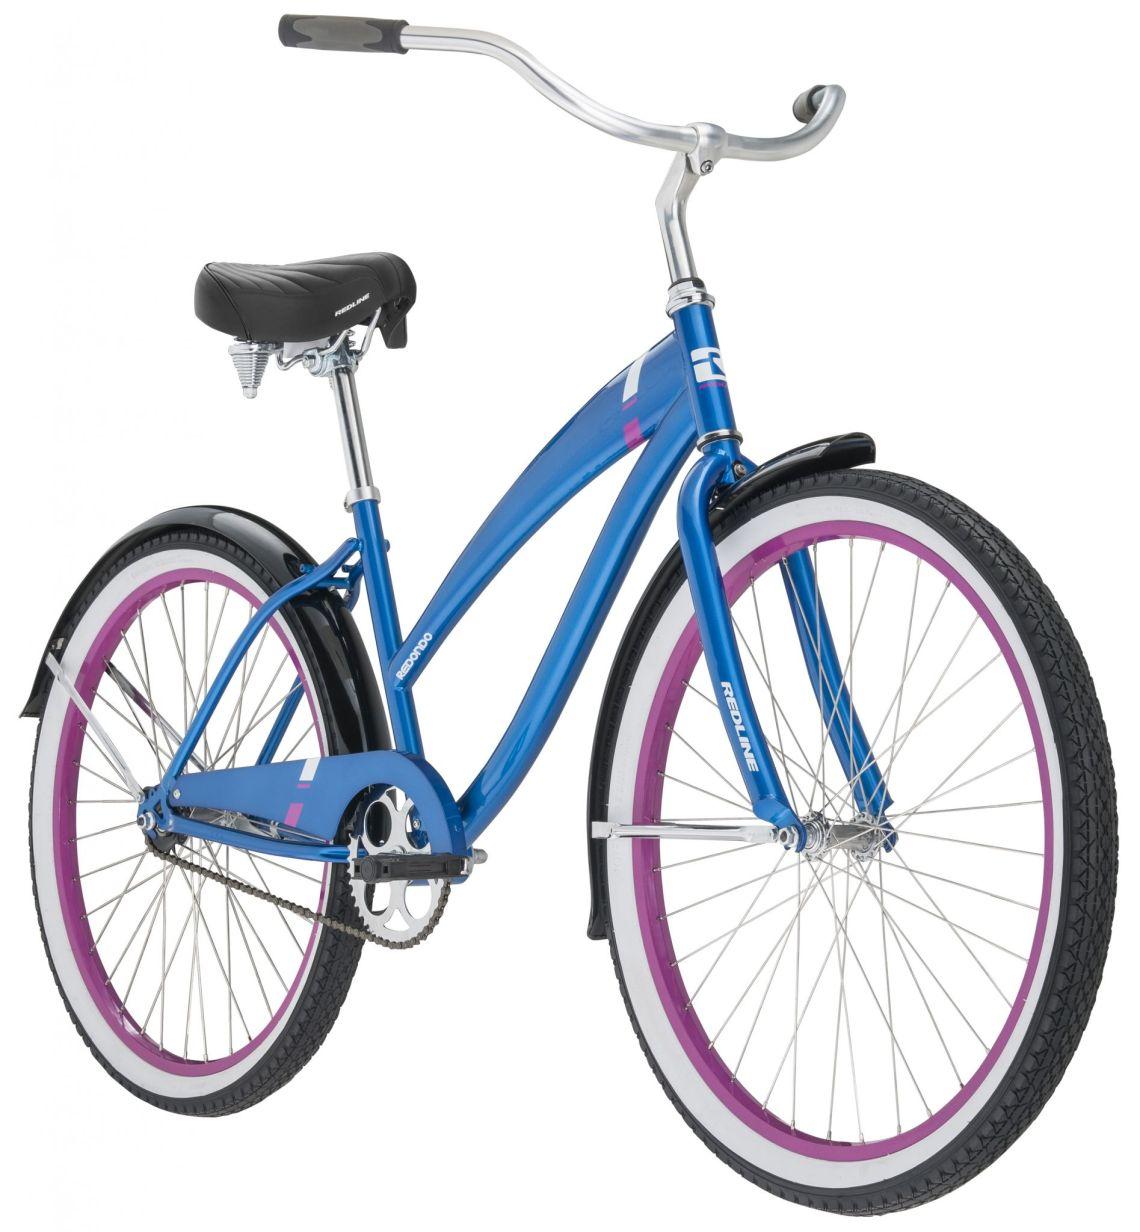 Redline Bikes Redondo Women's Cruiser Bike, One Size, Blue - Walmart.com